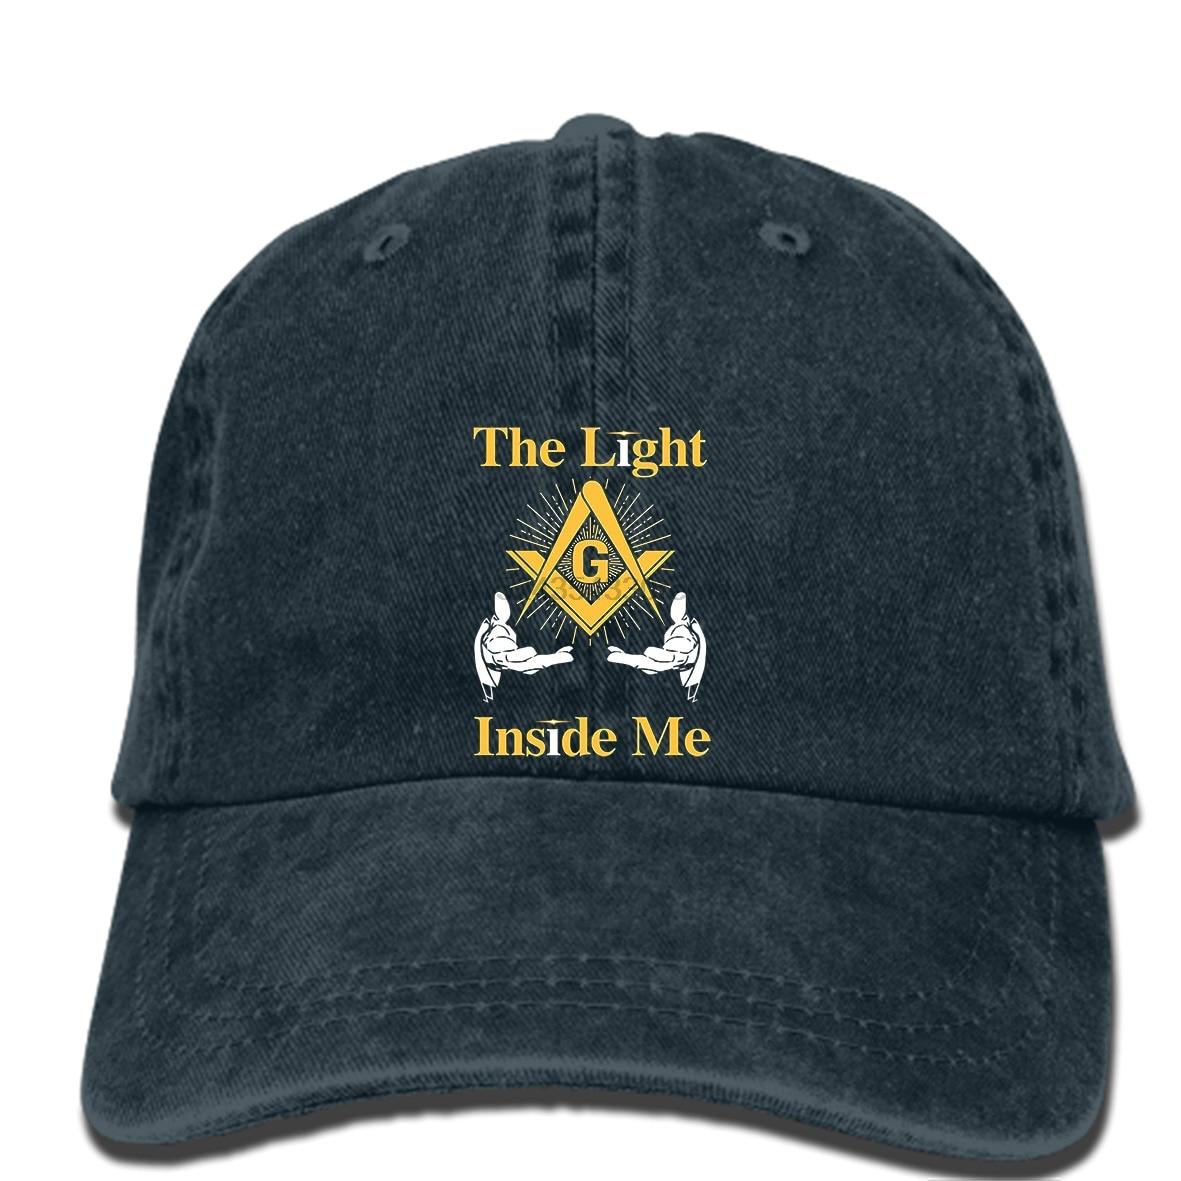 Detail Feedback Questions about hip hop Baseball caps The Masonic Store  Freemason the Light Inside Me Men s hat New Fashion Comfortableness s Black  on ... e2dfd249a97e